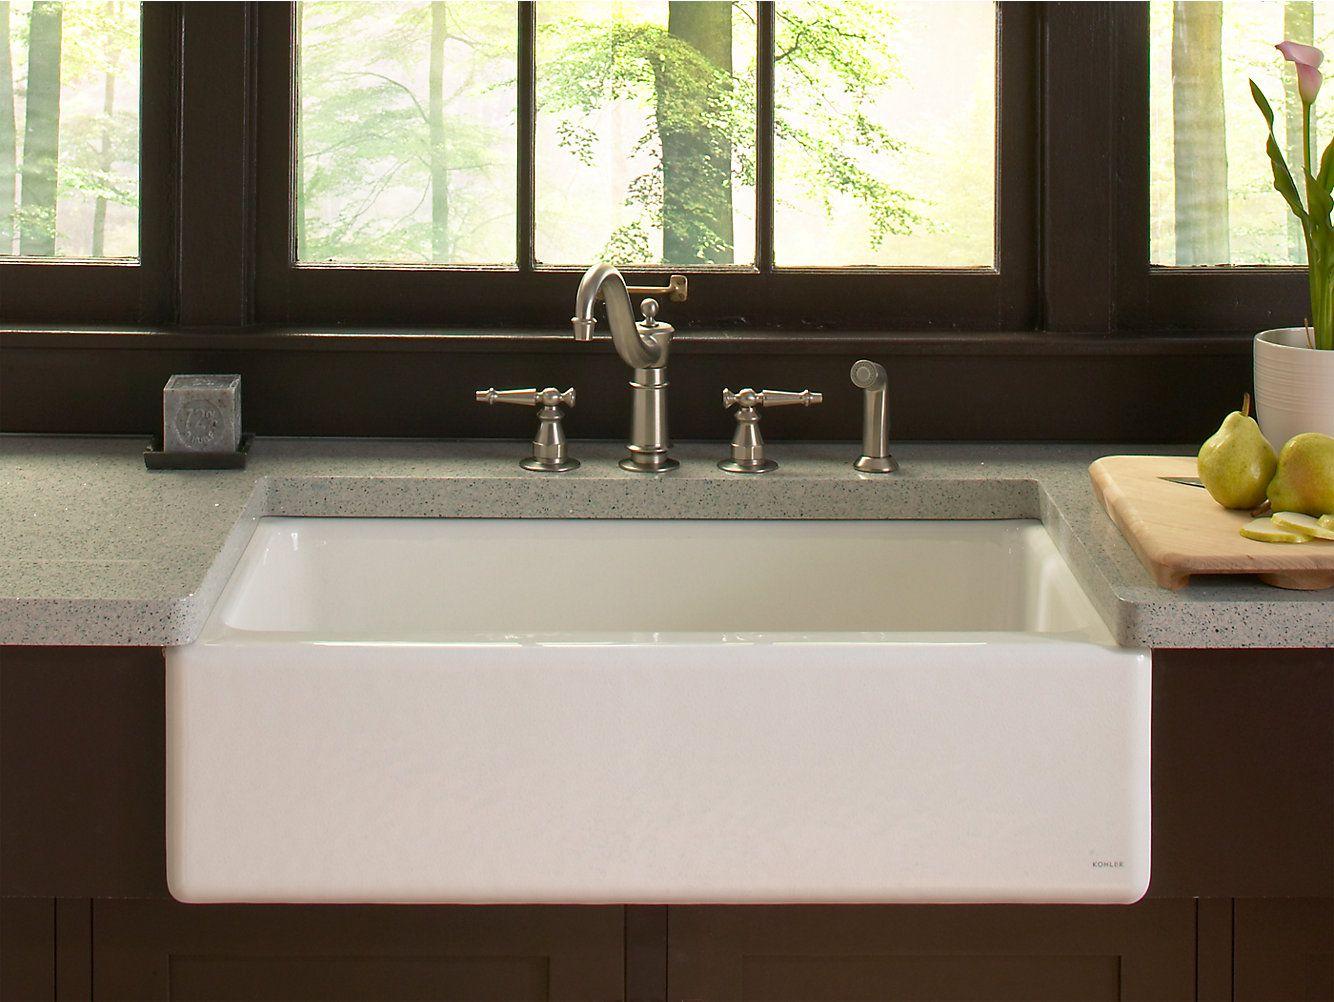 K 6546 4u Kohler Dickinson Apron Front Kitchen Sink With Four